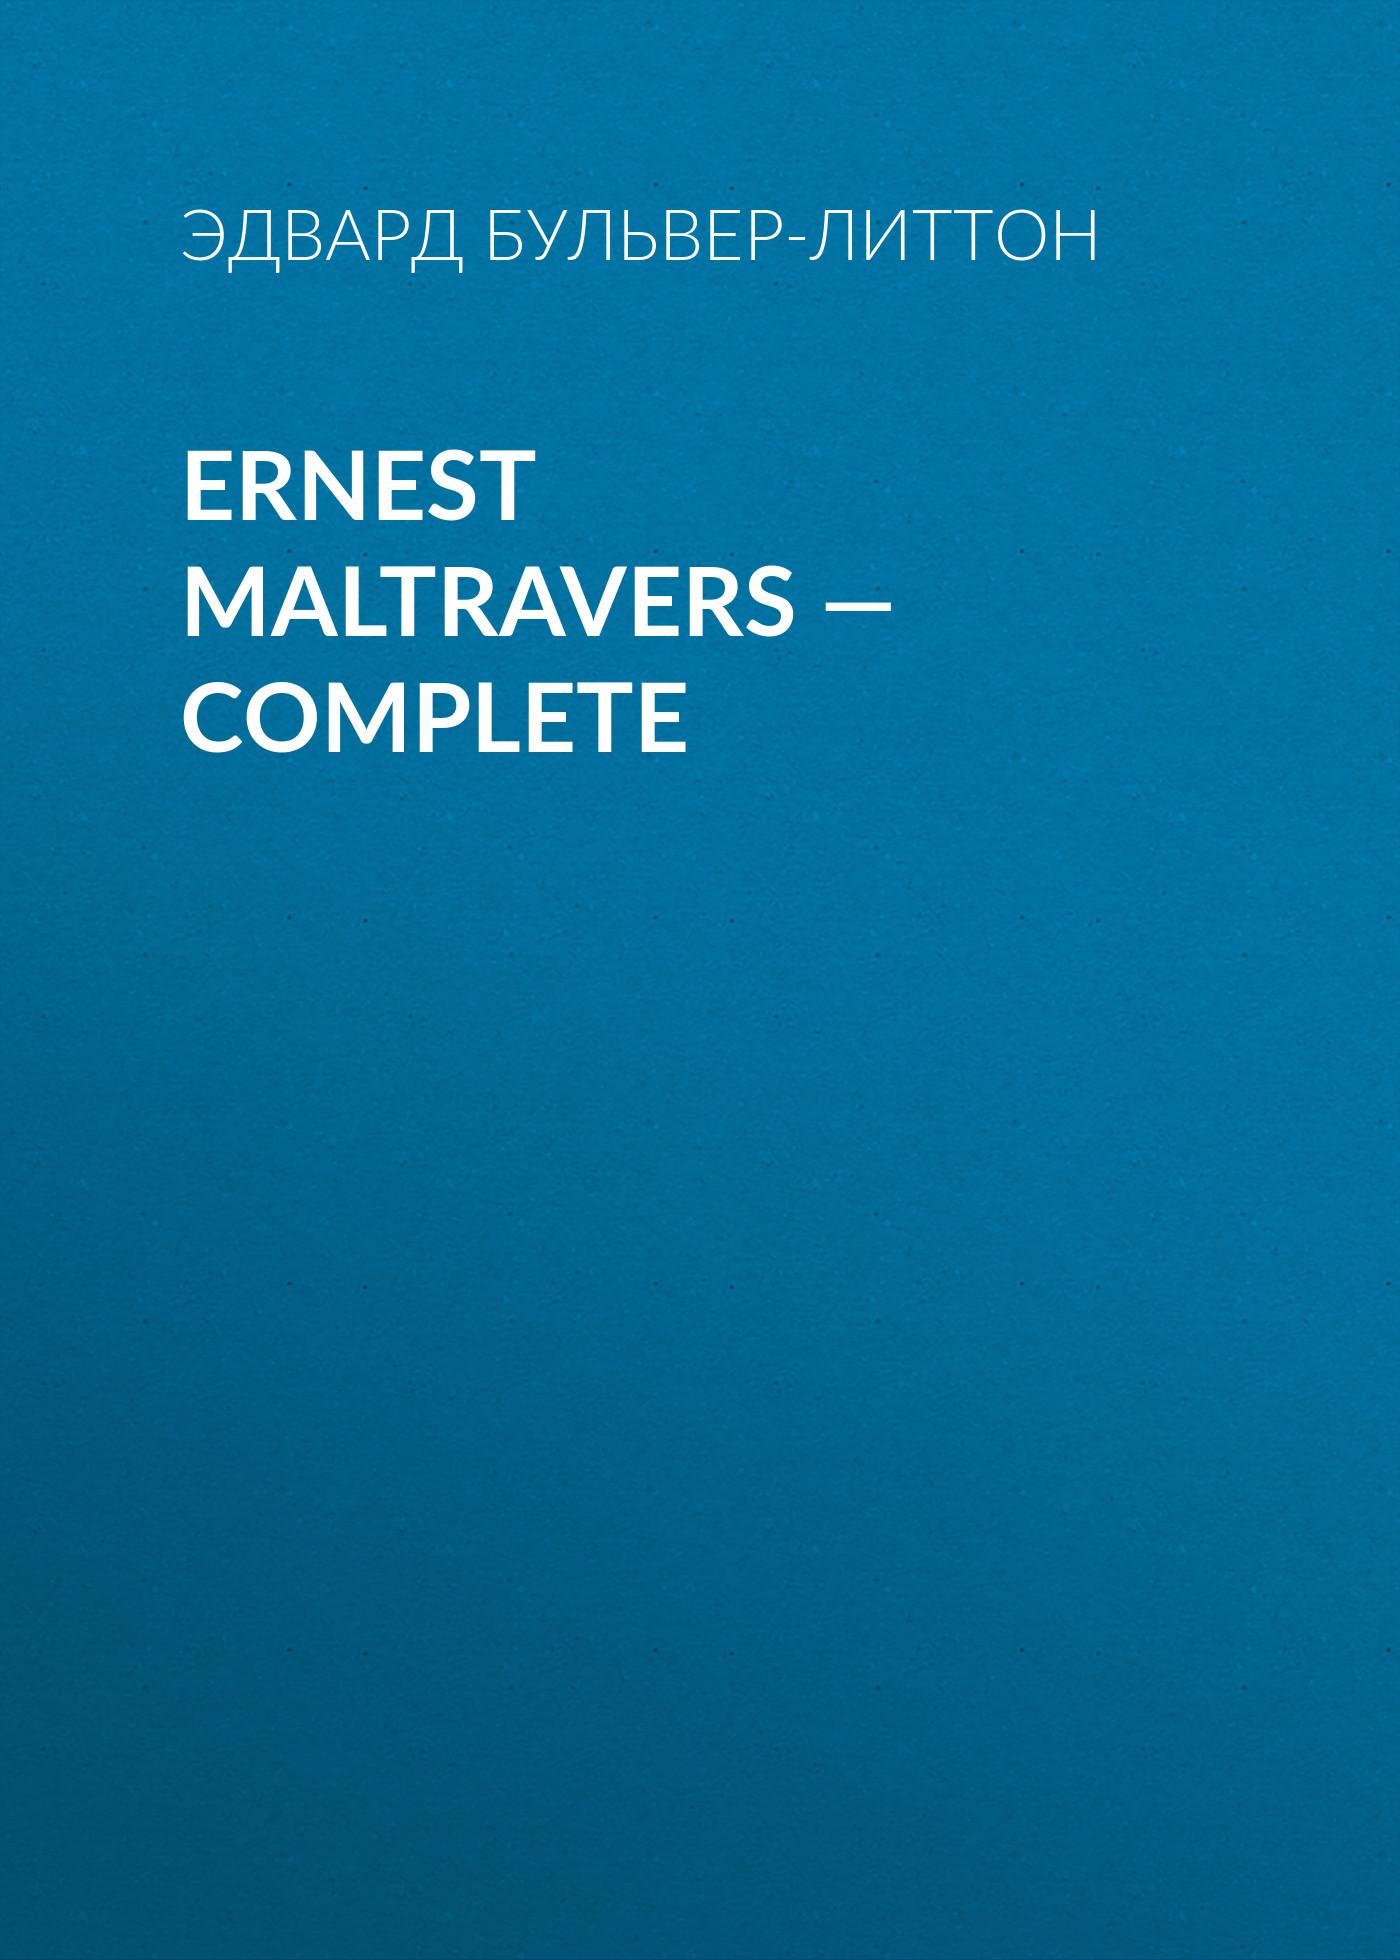 Ernest Maltravers — Complete